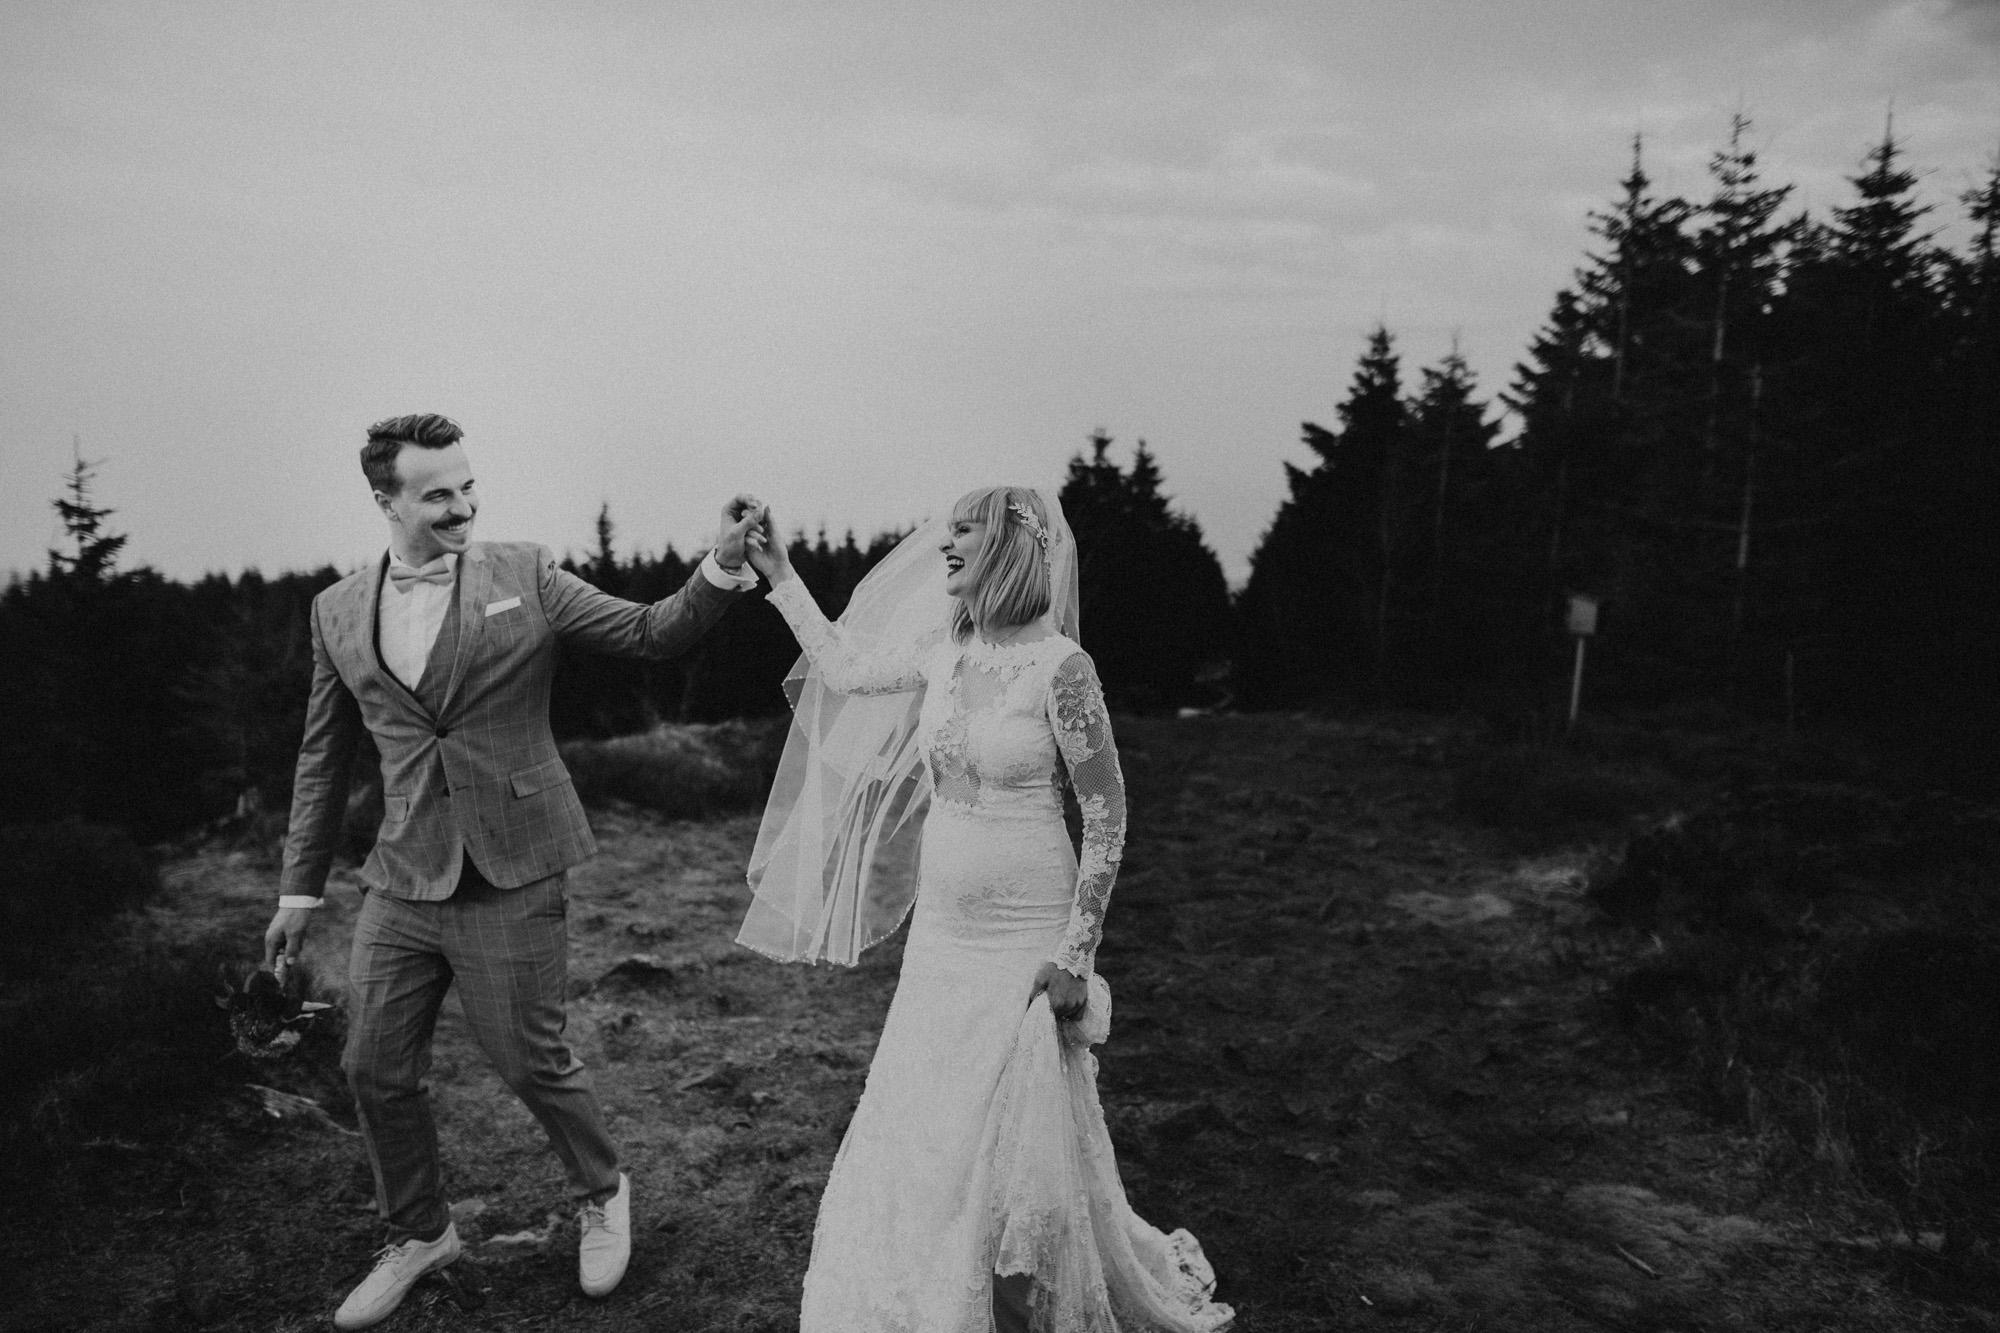 DanielaMarquardtPhotography_Hochzeitsfotograf_Düsseldorf_Köln_Mallorca_Bayern_Austria_Harz_LinaundMaik_Afterwedding-Shooting_Weddingphotographer_Ibiza_Tuskany_Italien_Toskana64